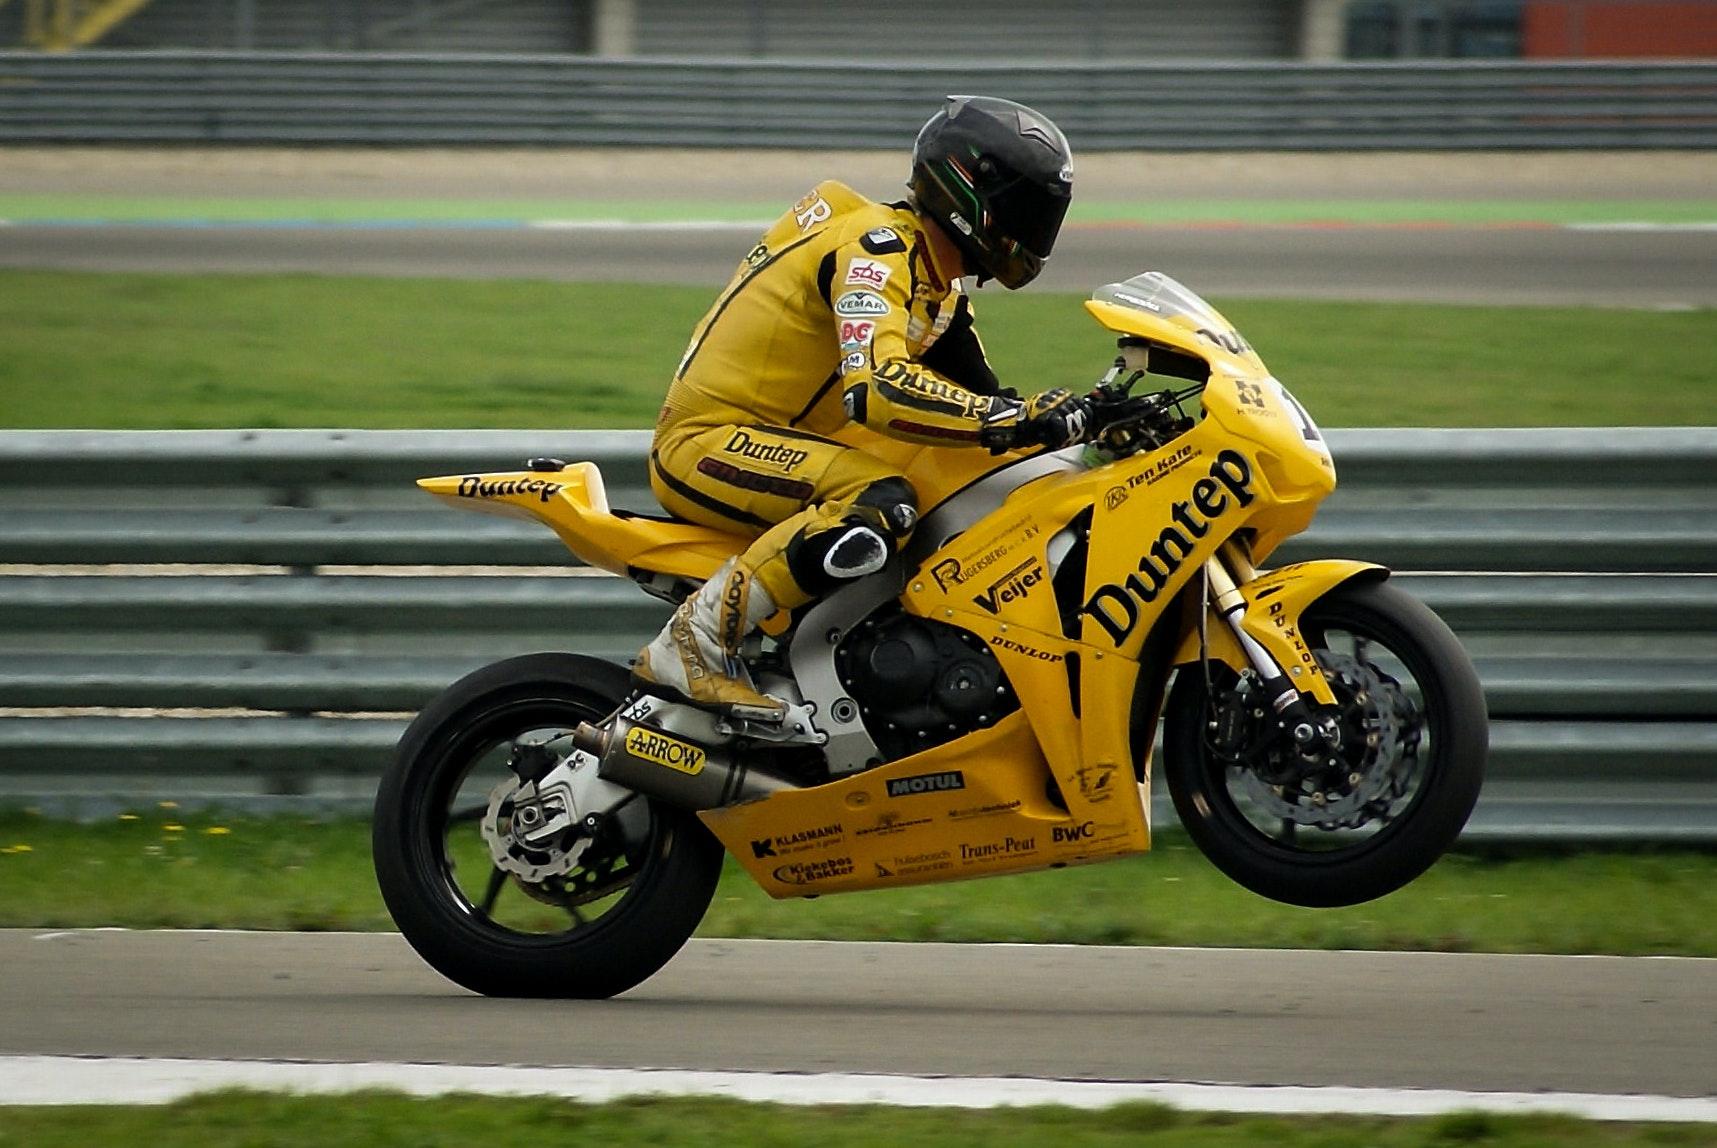 Person Riding On Yellow Sports Bike Free Stock Photo